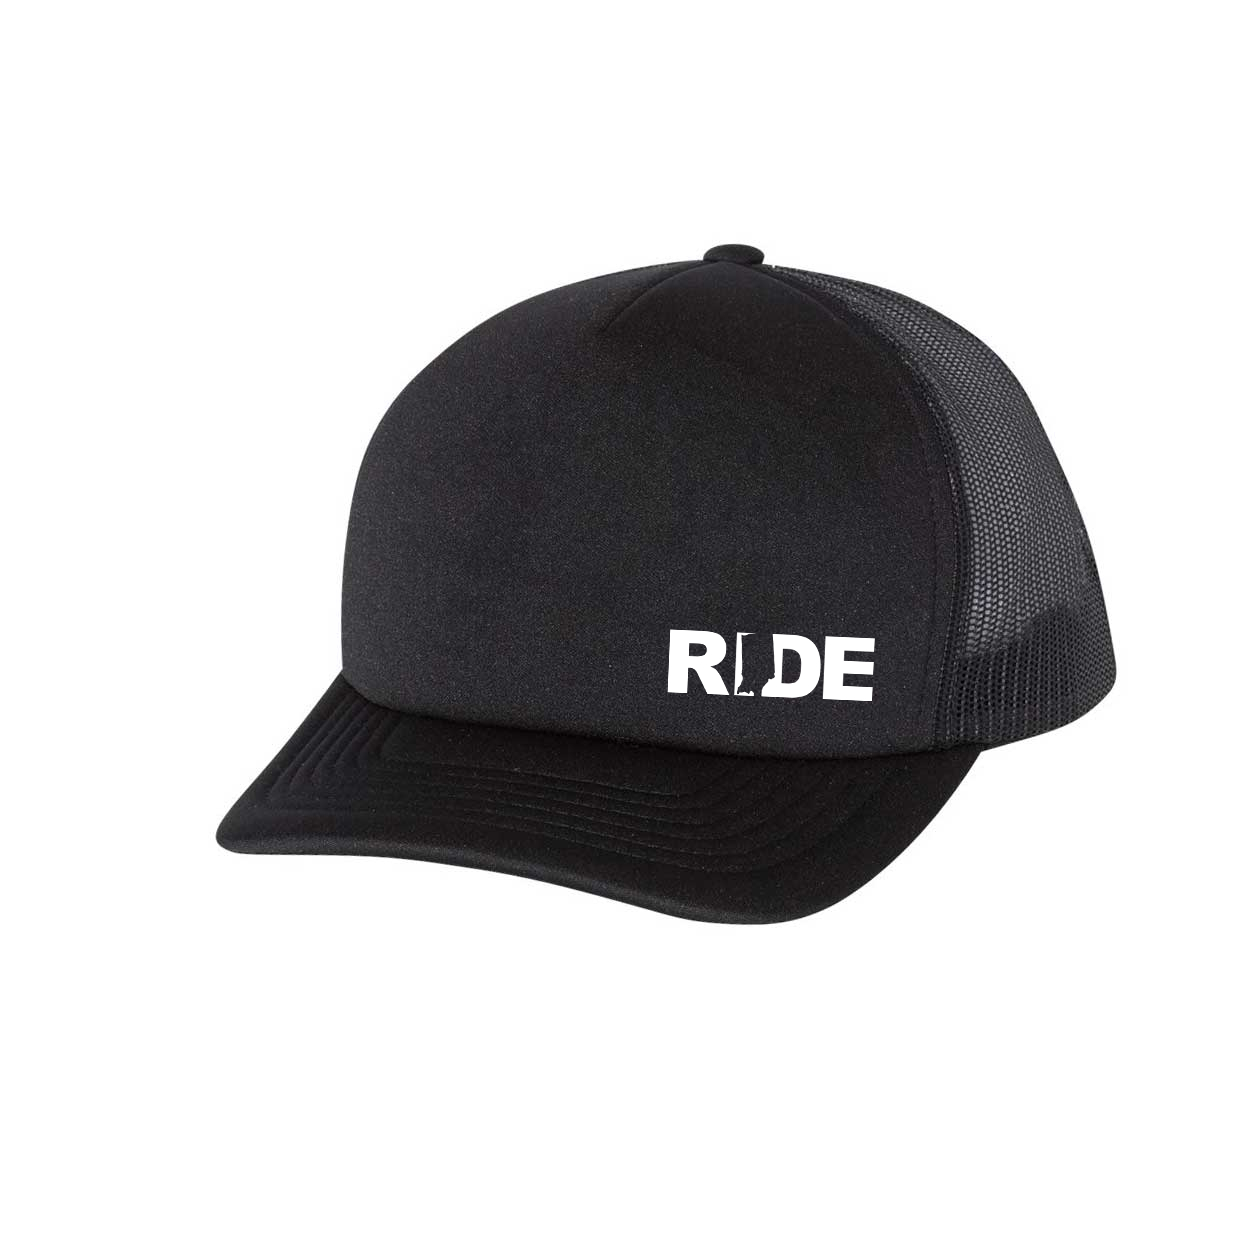 Ride Indiana Night Out Premium Foam Trucker Snapback Hat Black (White Logo)